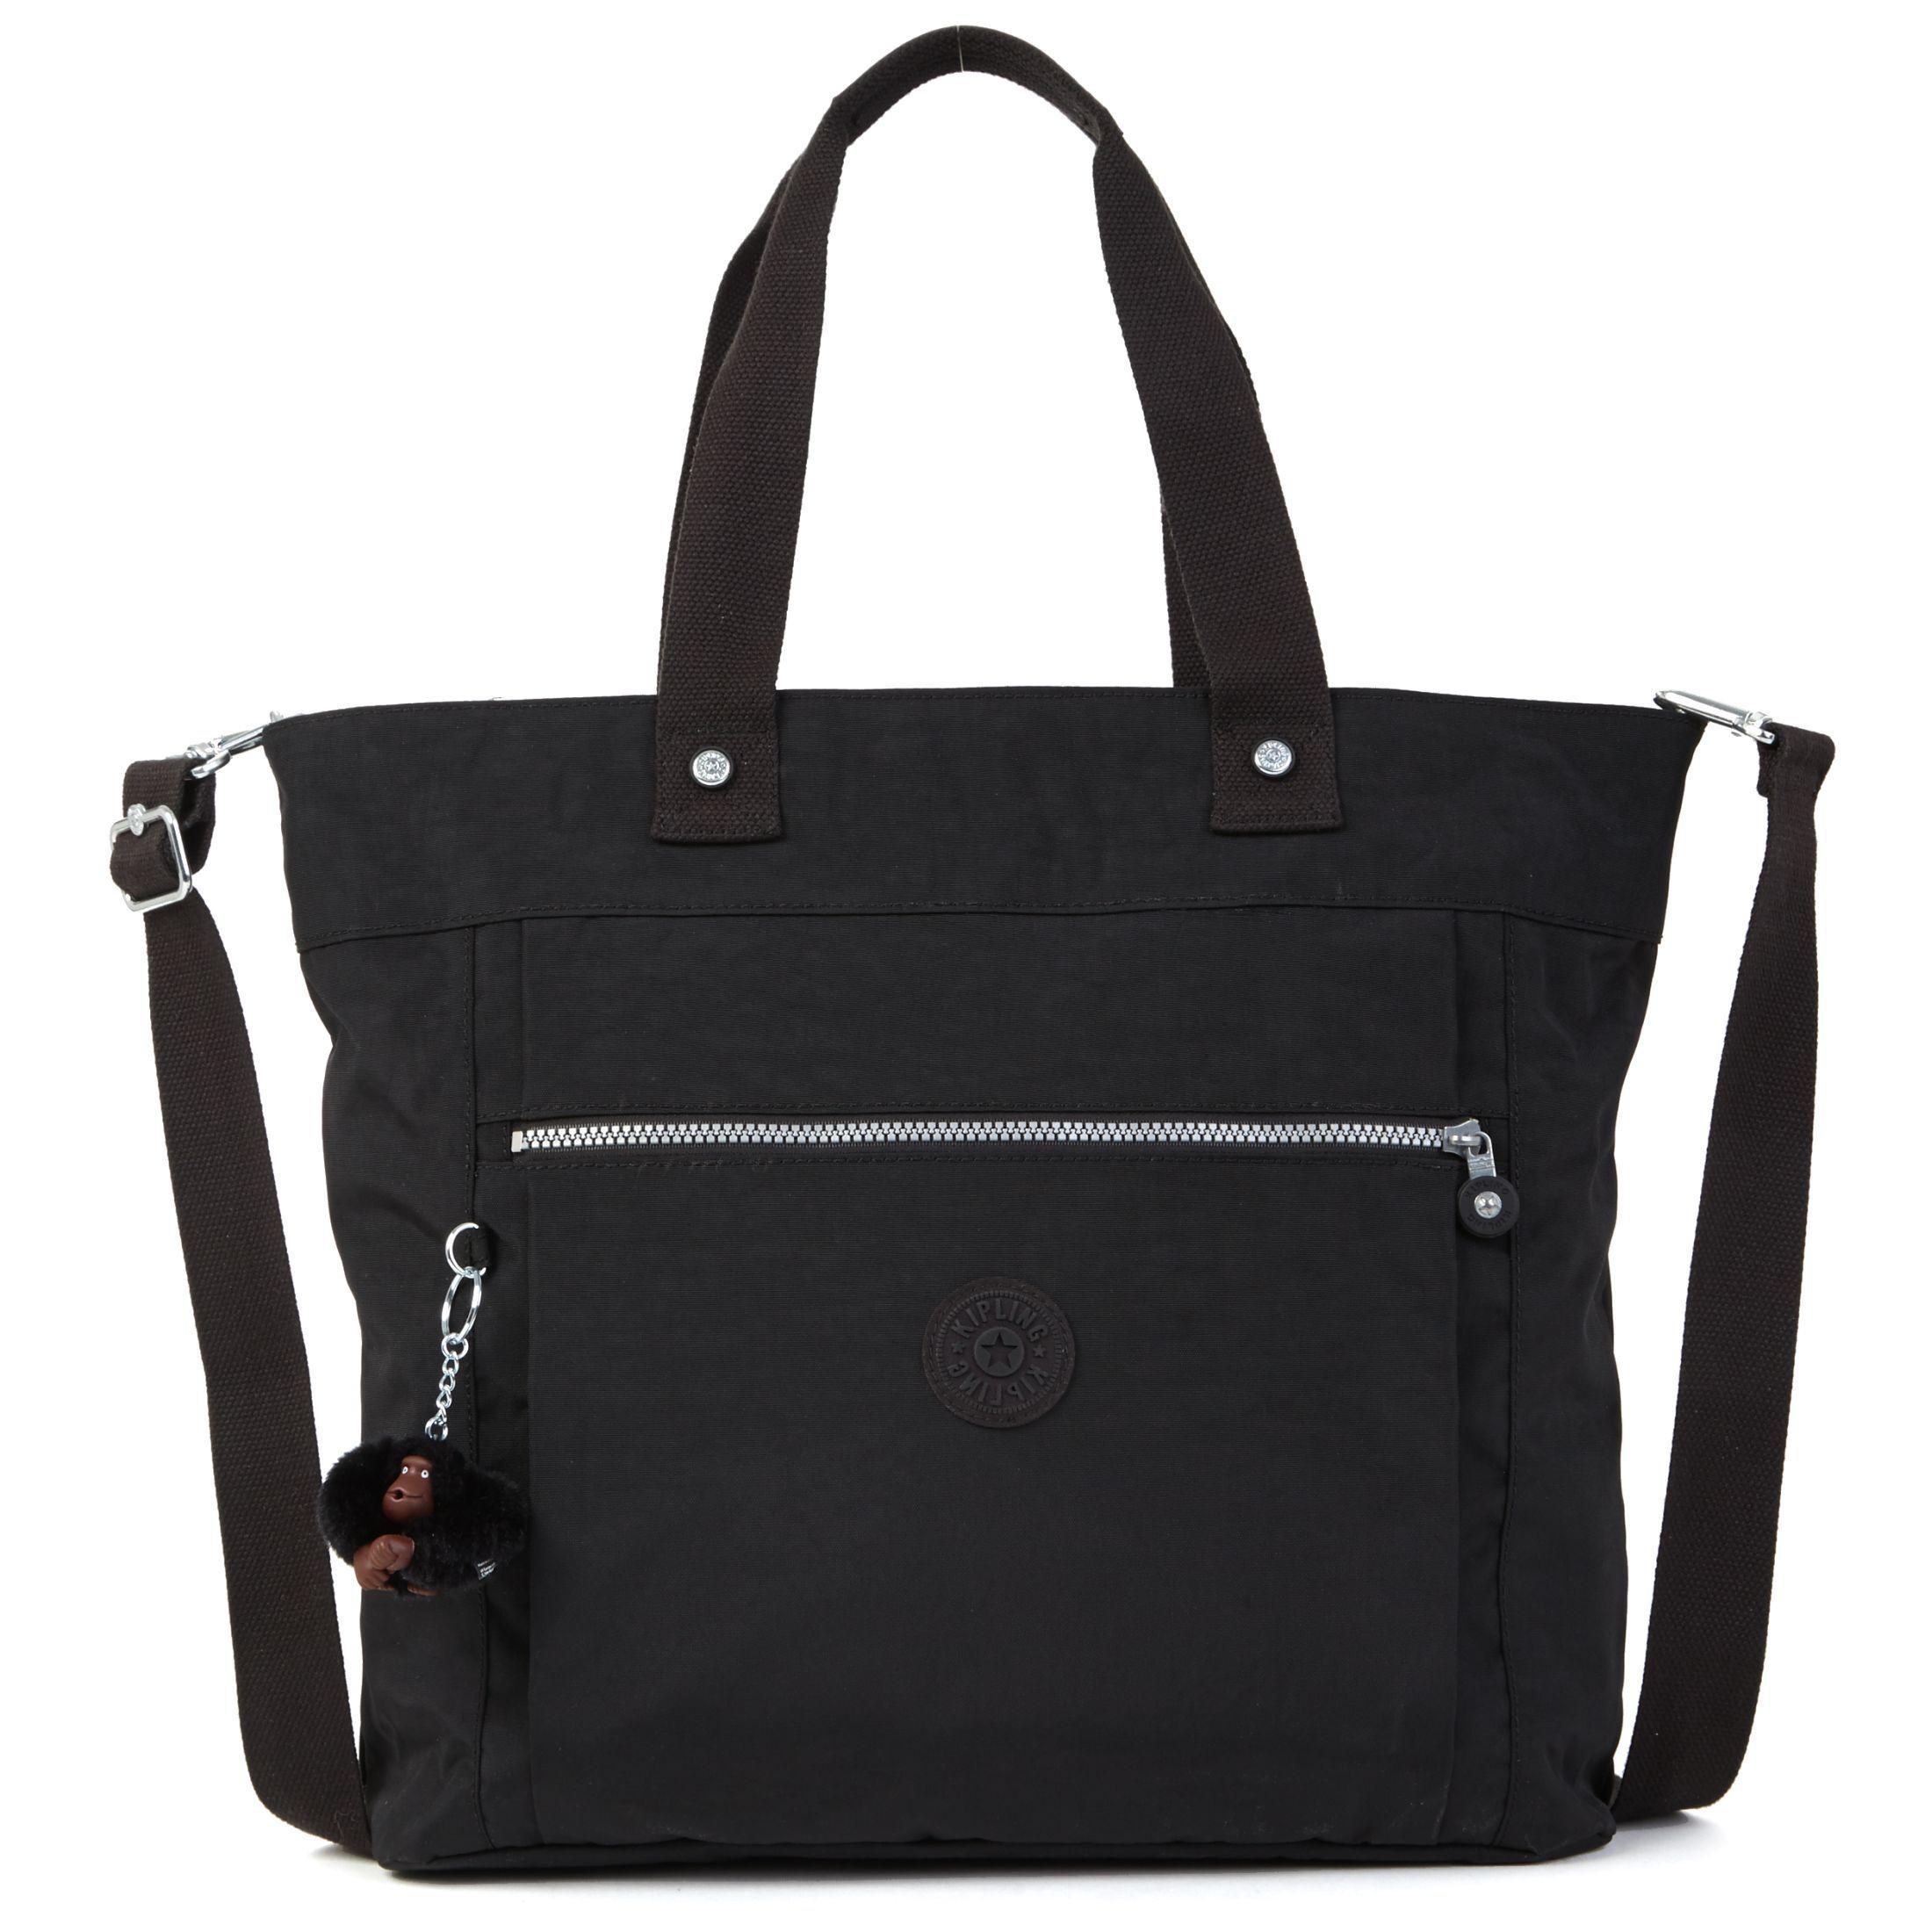 67d263523 Lizzie Tote Bag - Vibrant Pink | Bags | Laptop tote bag, Printed ...